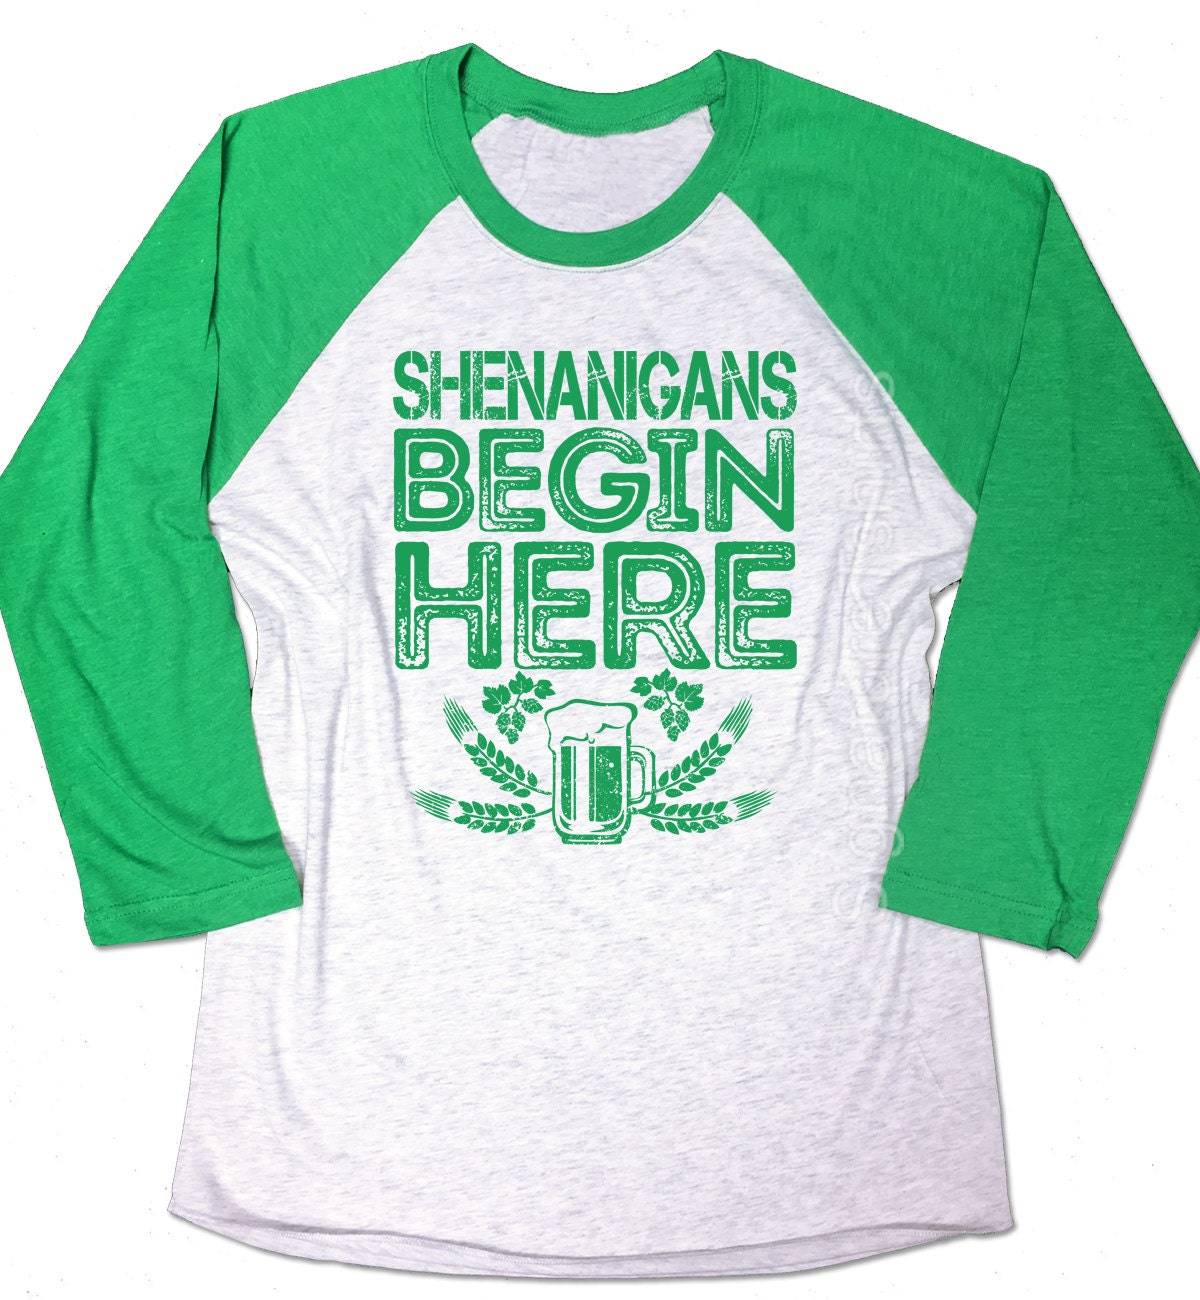 Design your own t shirt dublin - Shenanigans Begin Here Shirt Shenanigans Shirt Funny Mens Irish T Shirt St Patricks Day Shirt Unisex Baseball Shirt St Paddys Tee Shirt